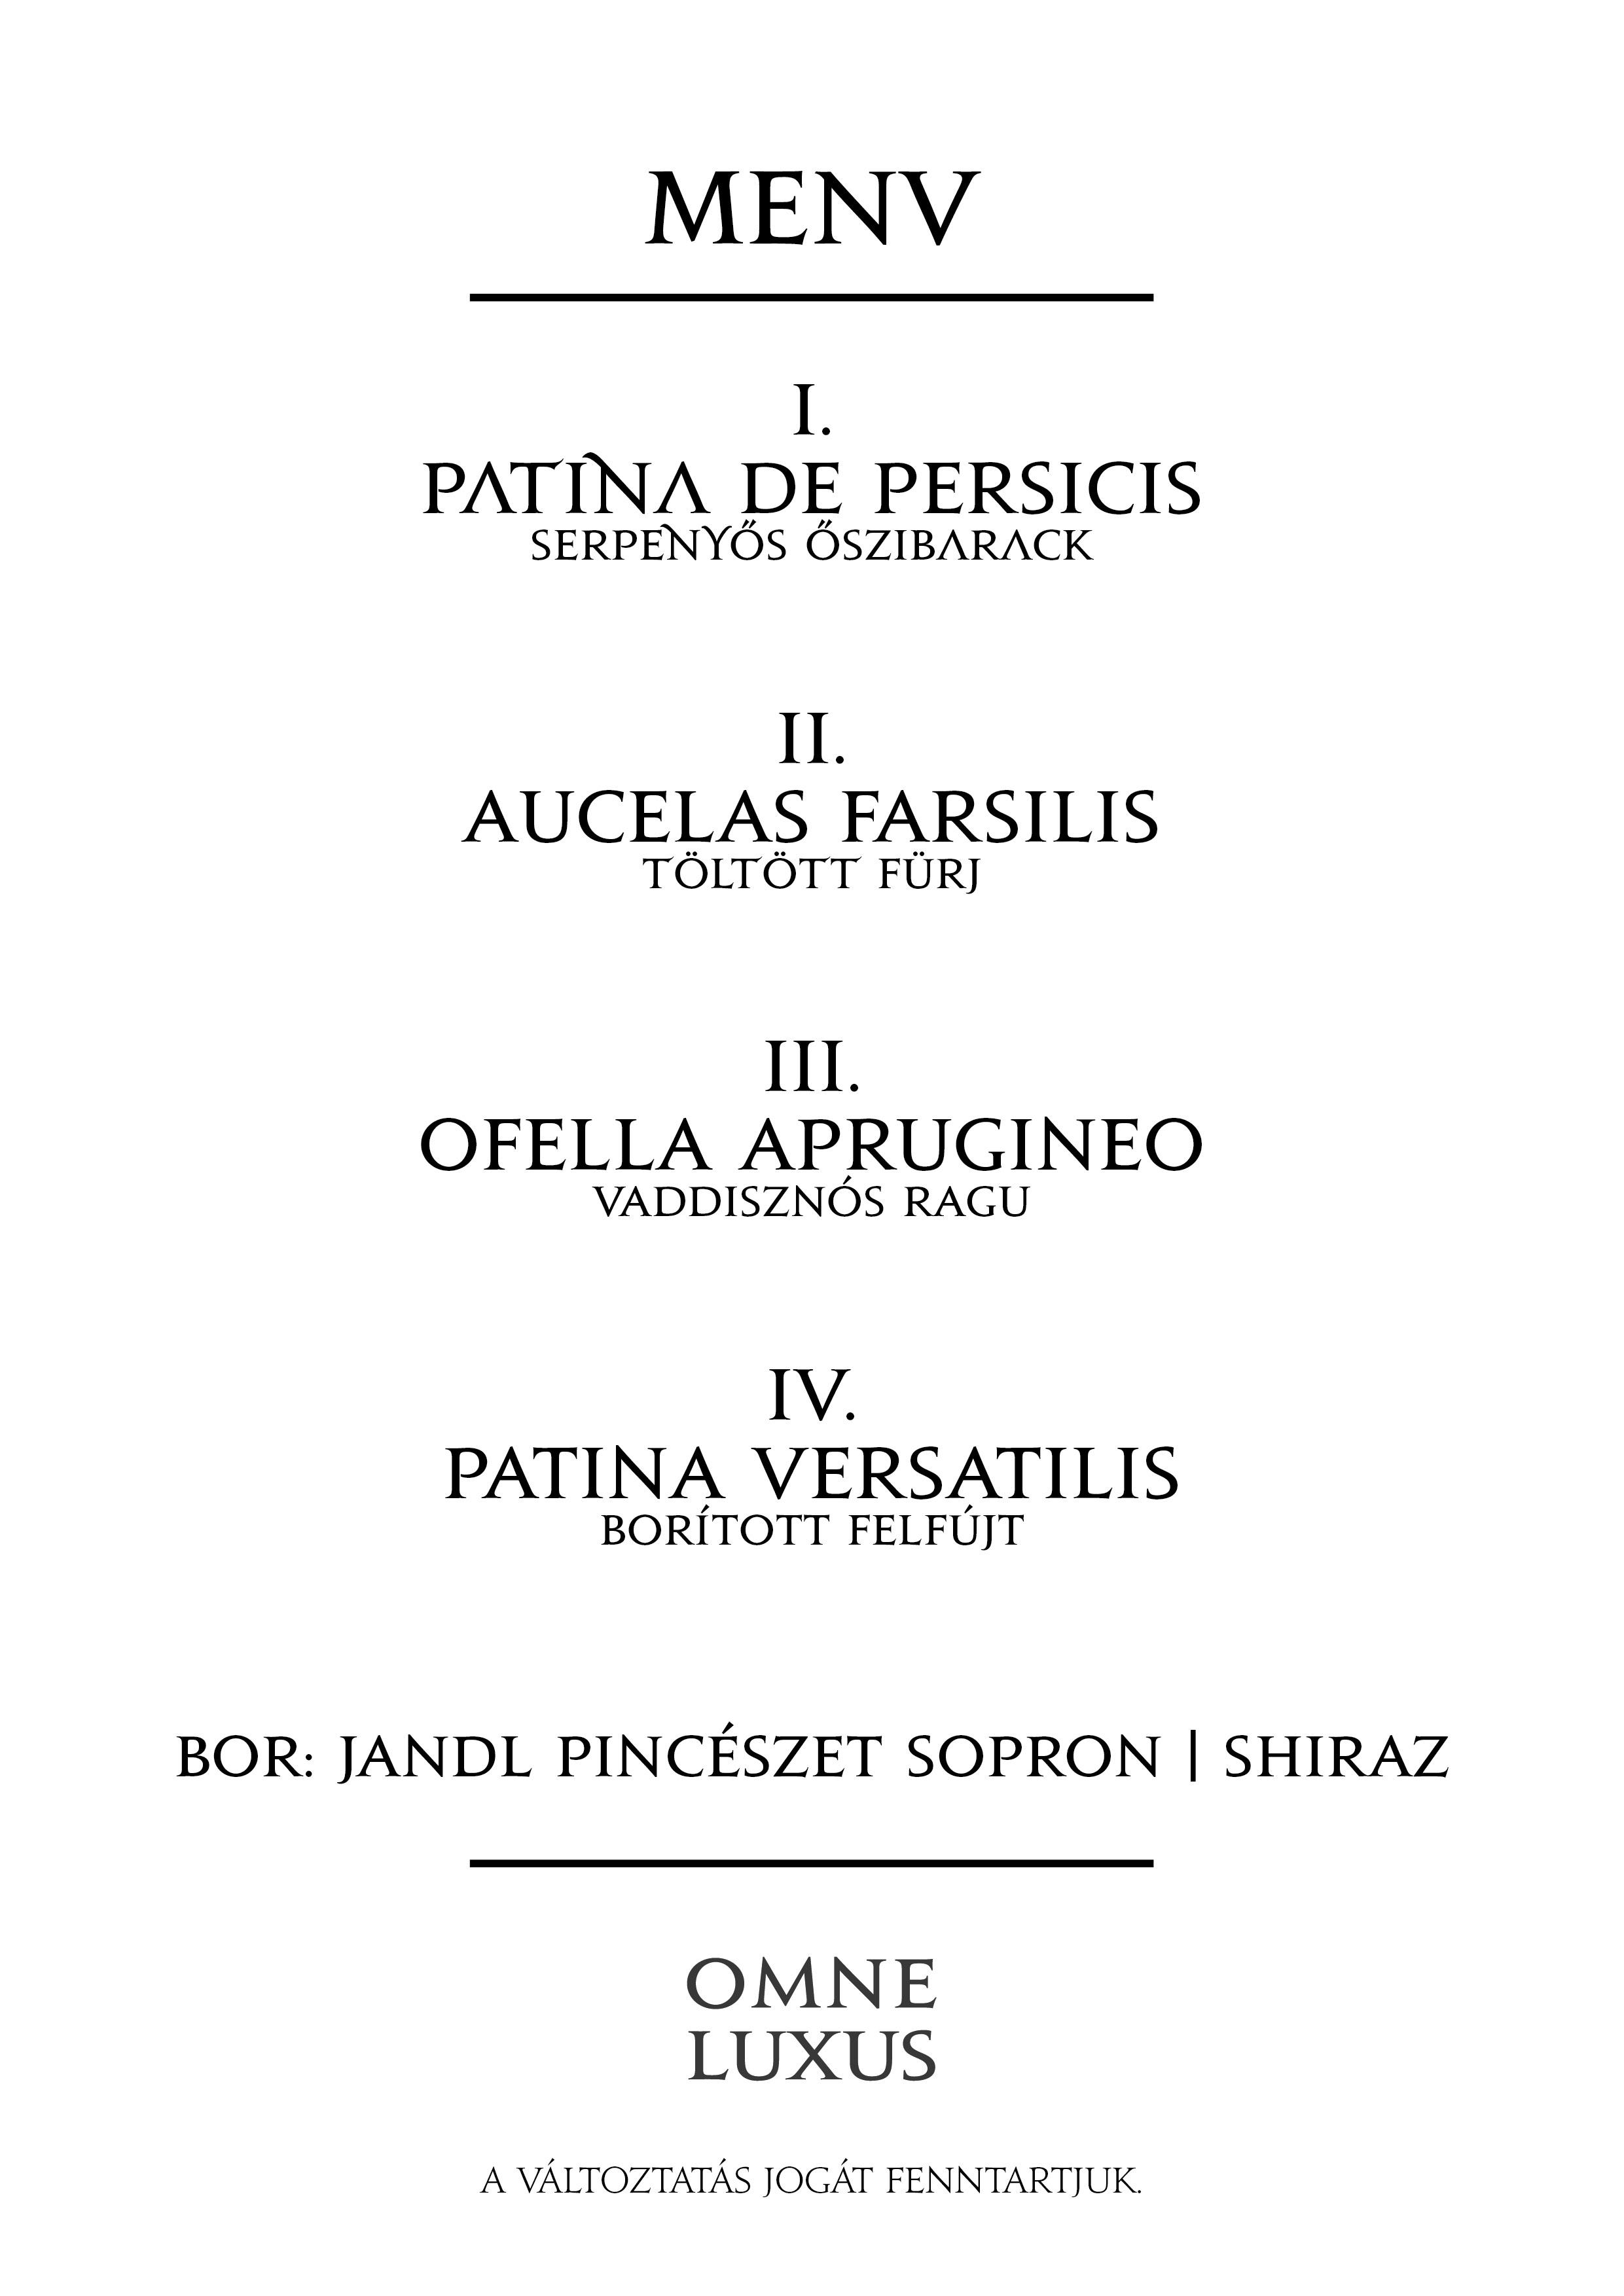 cena_vinalia_mmxviii_menu.jpg